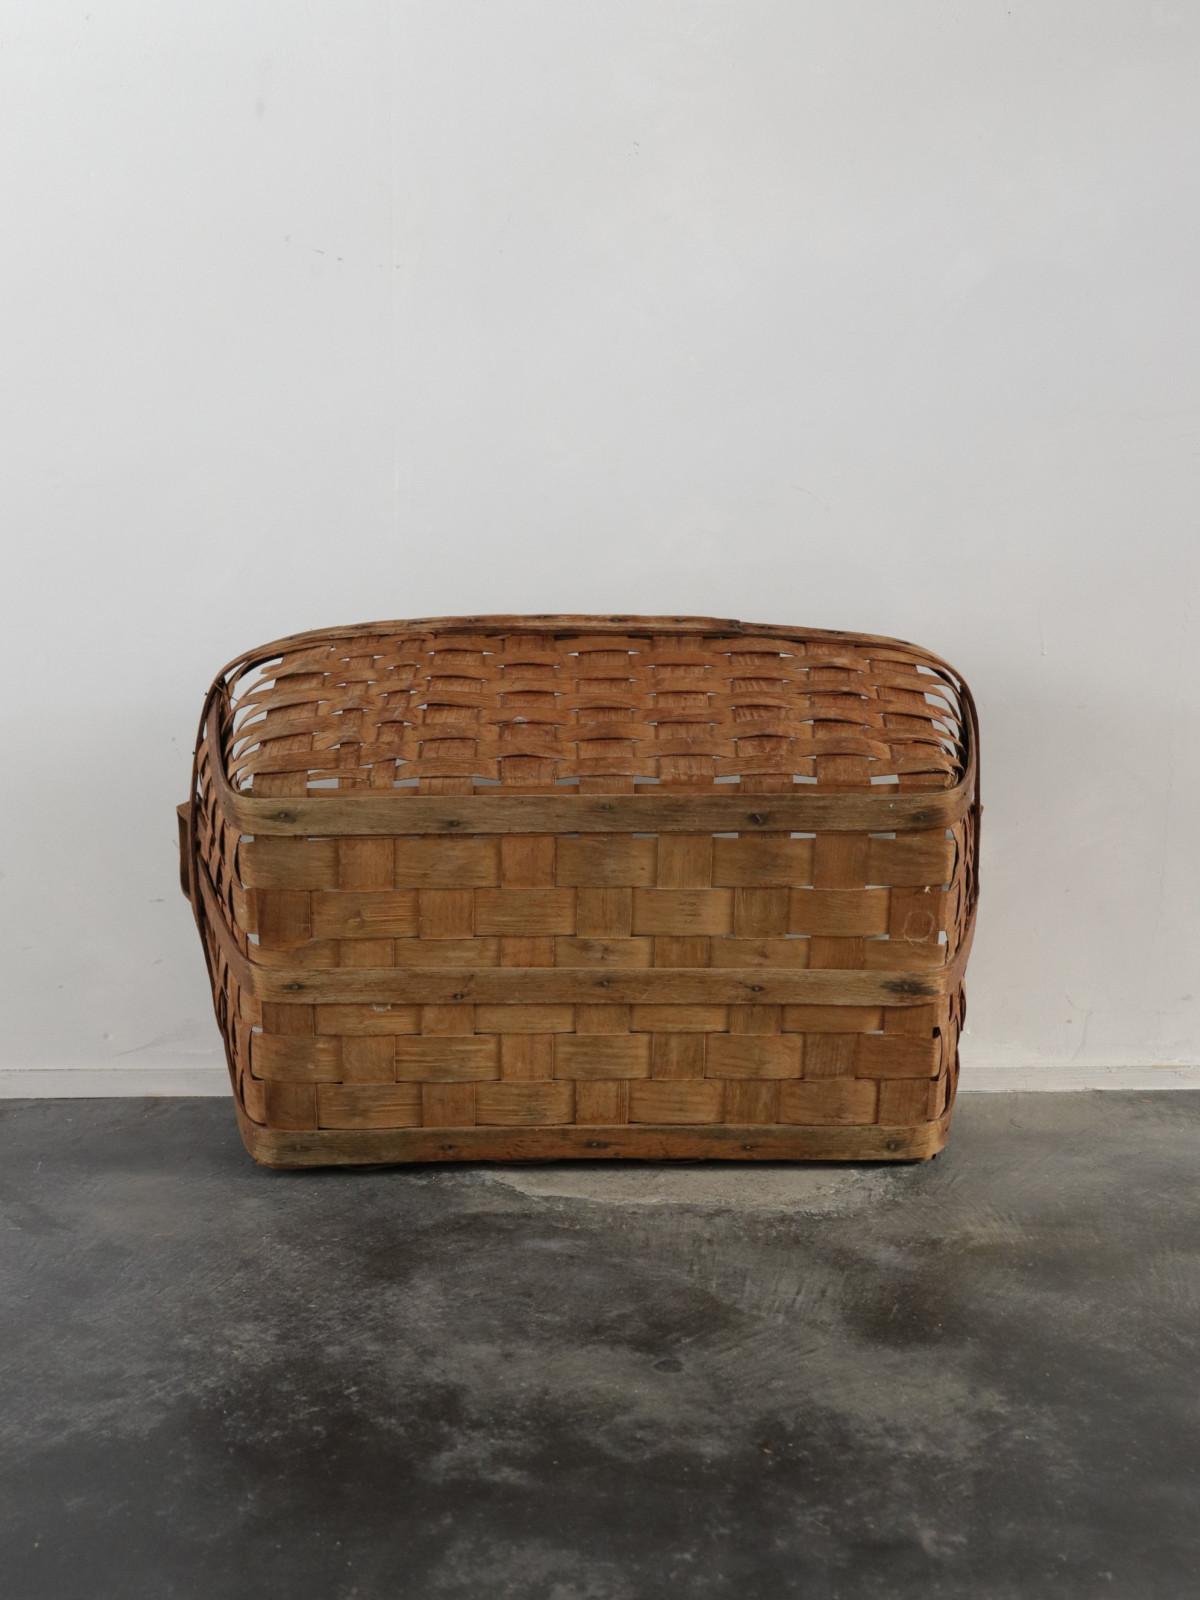 1930's,laundry basket,USA,Vintage